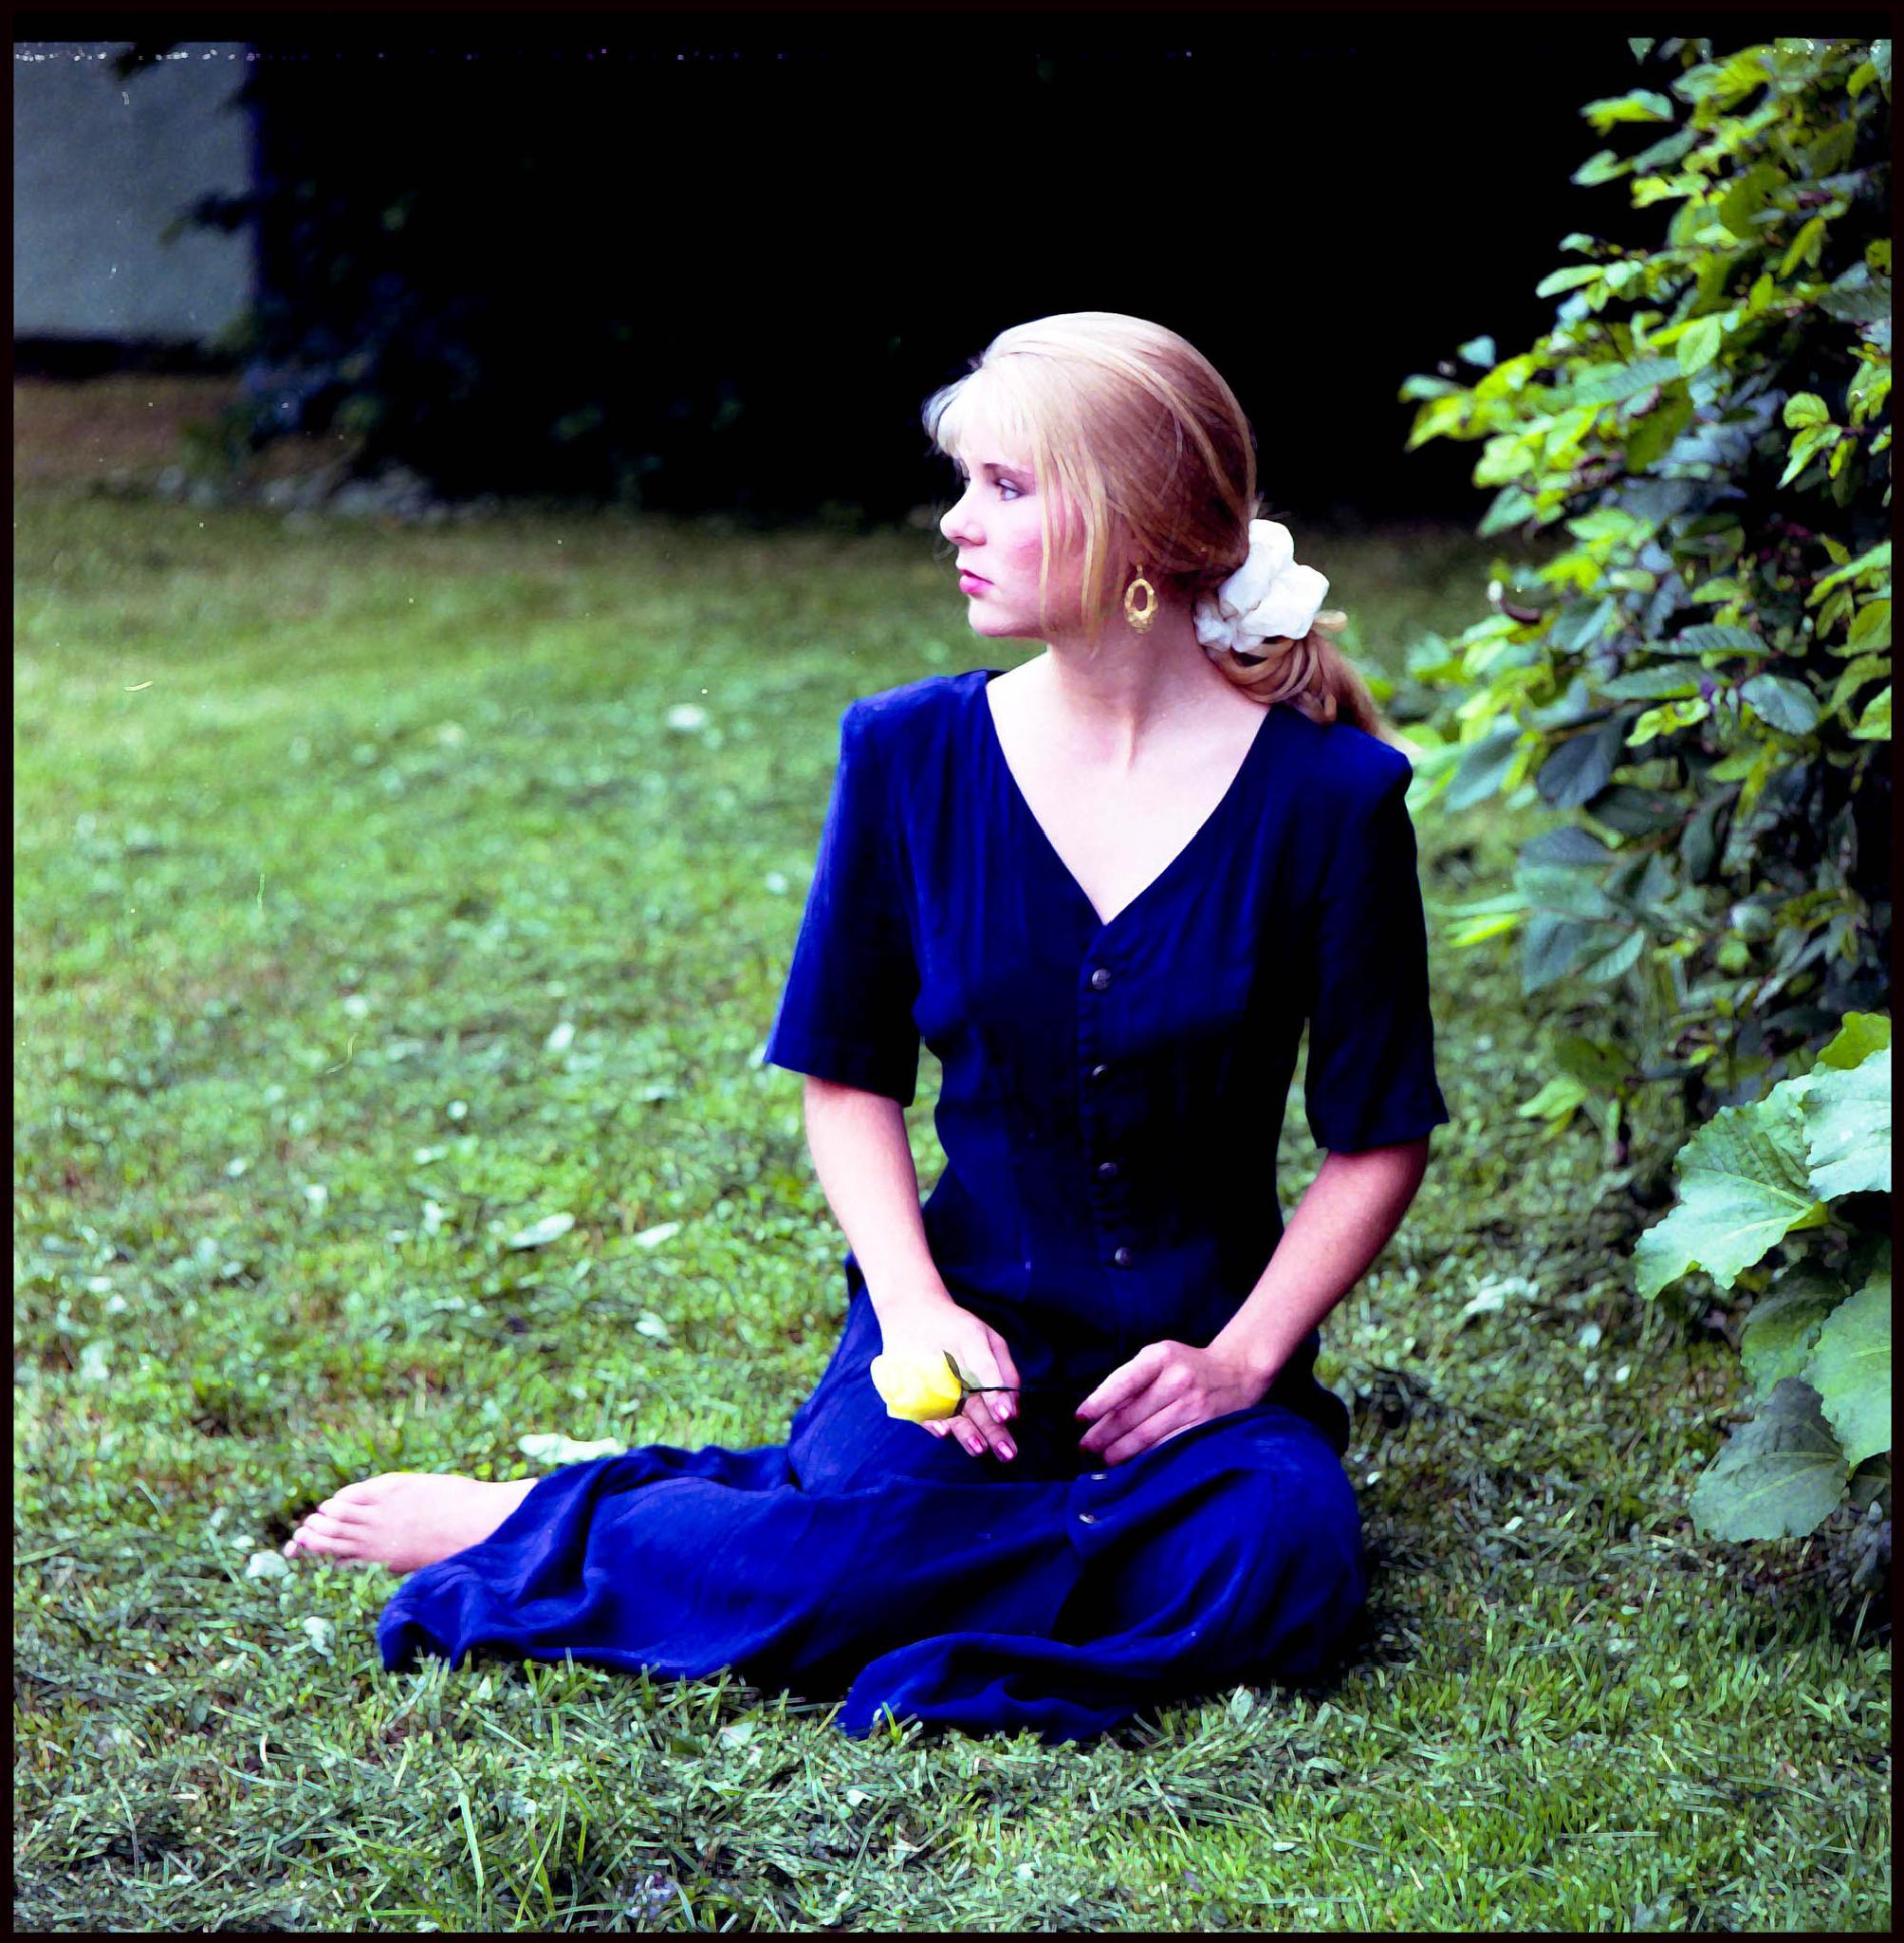 Heidi by wes.johnson.58